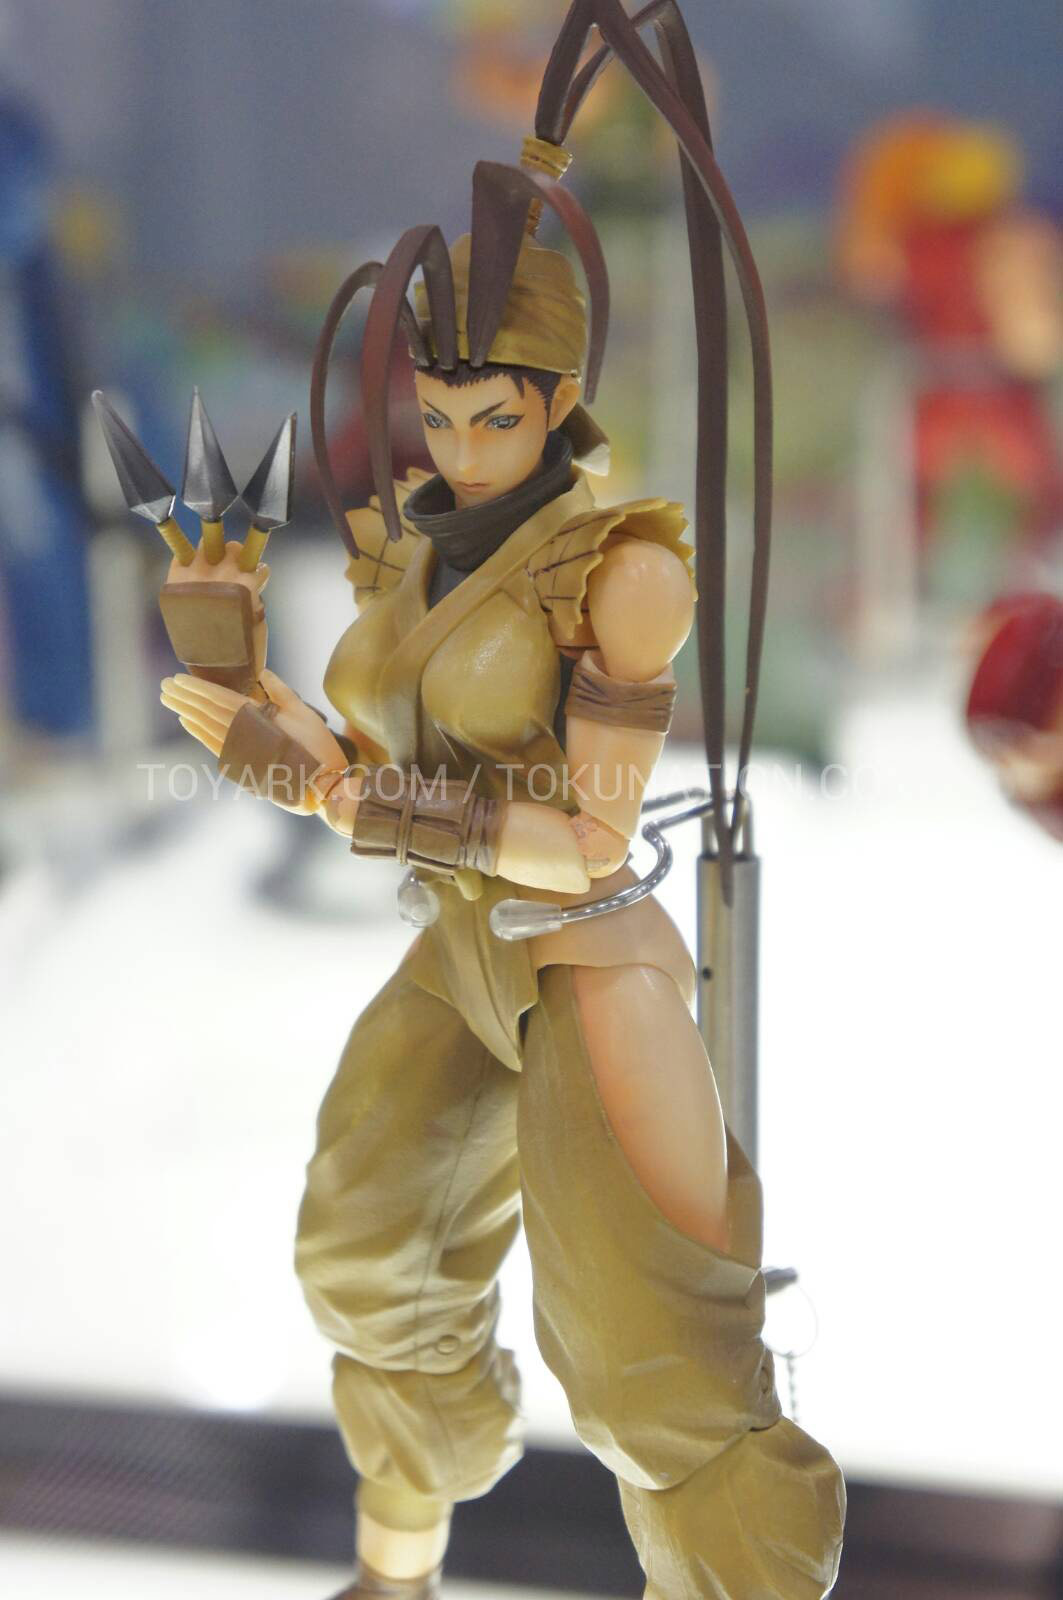 Play Arts Kai positionable figurines #06